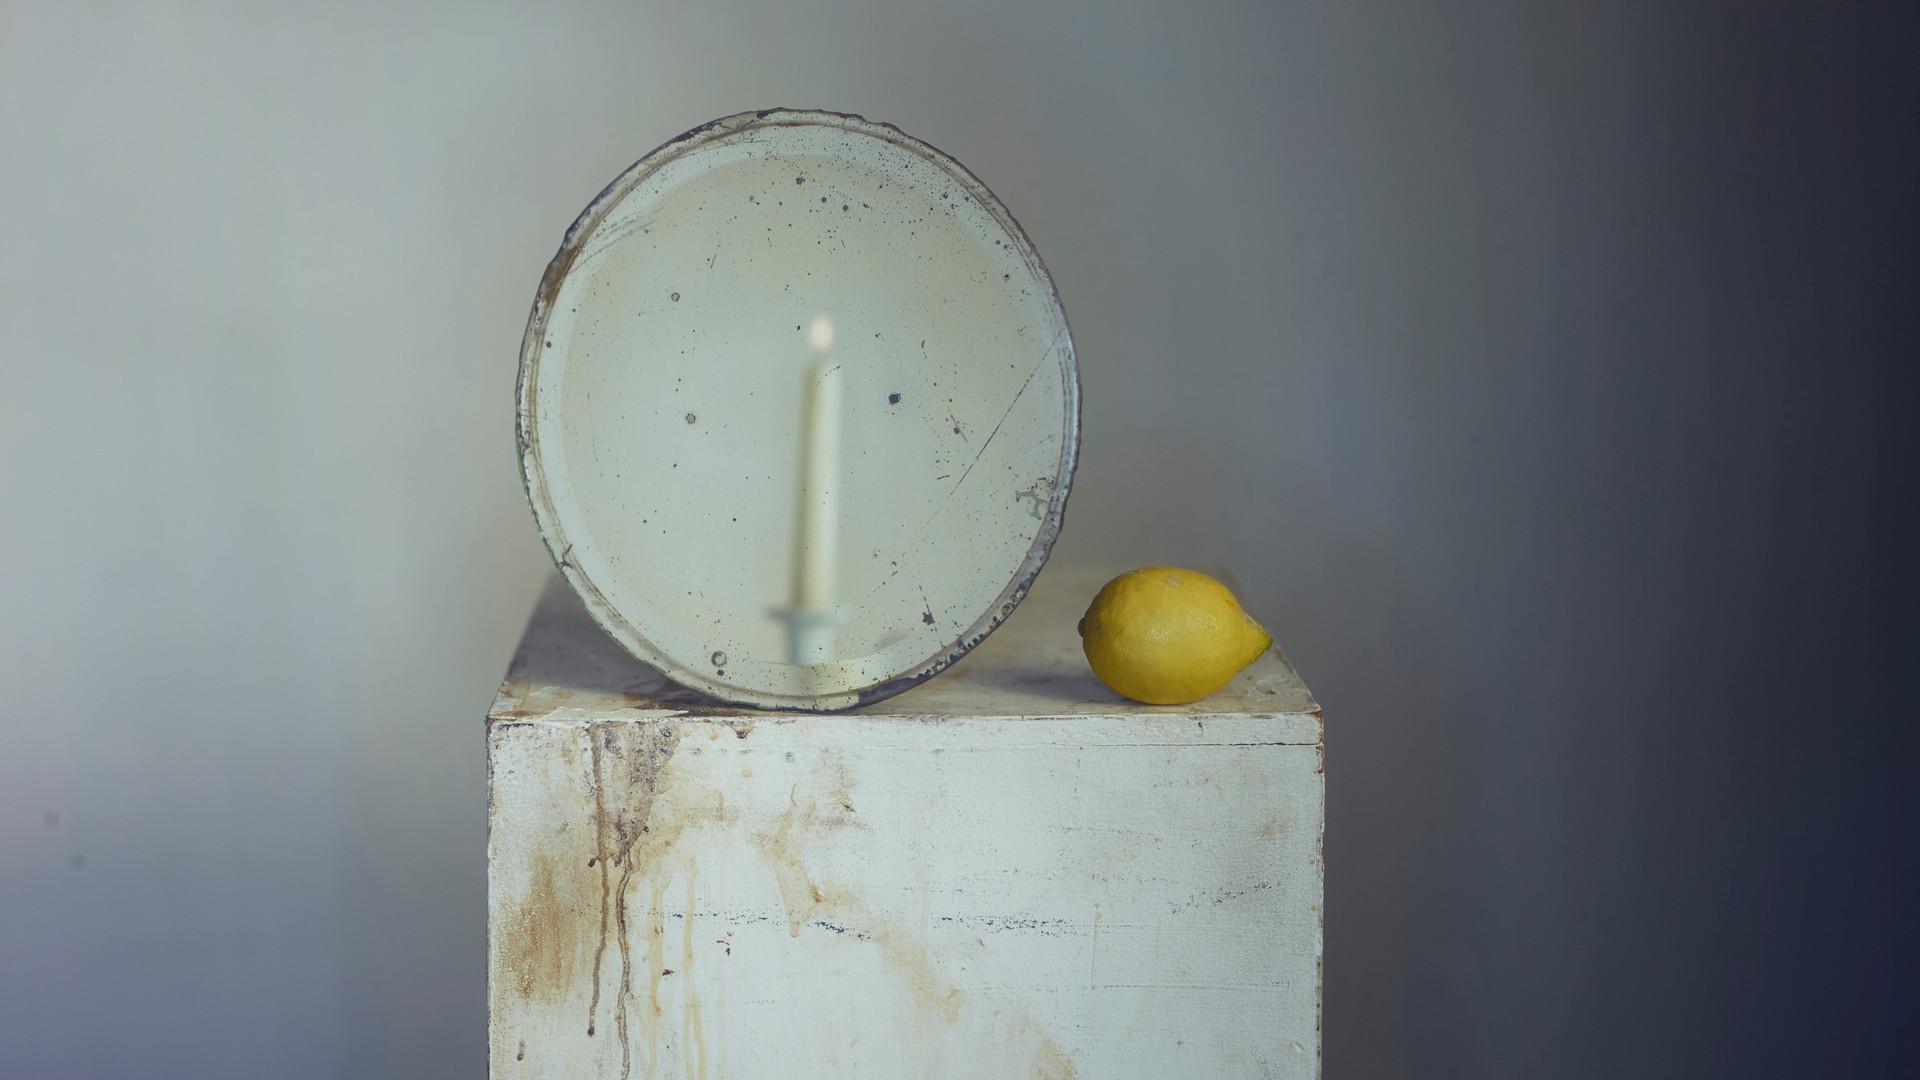 Richard Learoyd, Lemon, Mirror, Candle 4, 2019